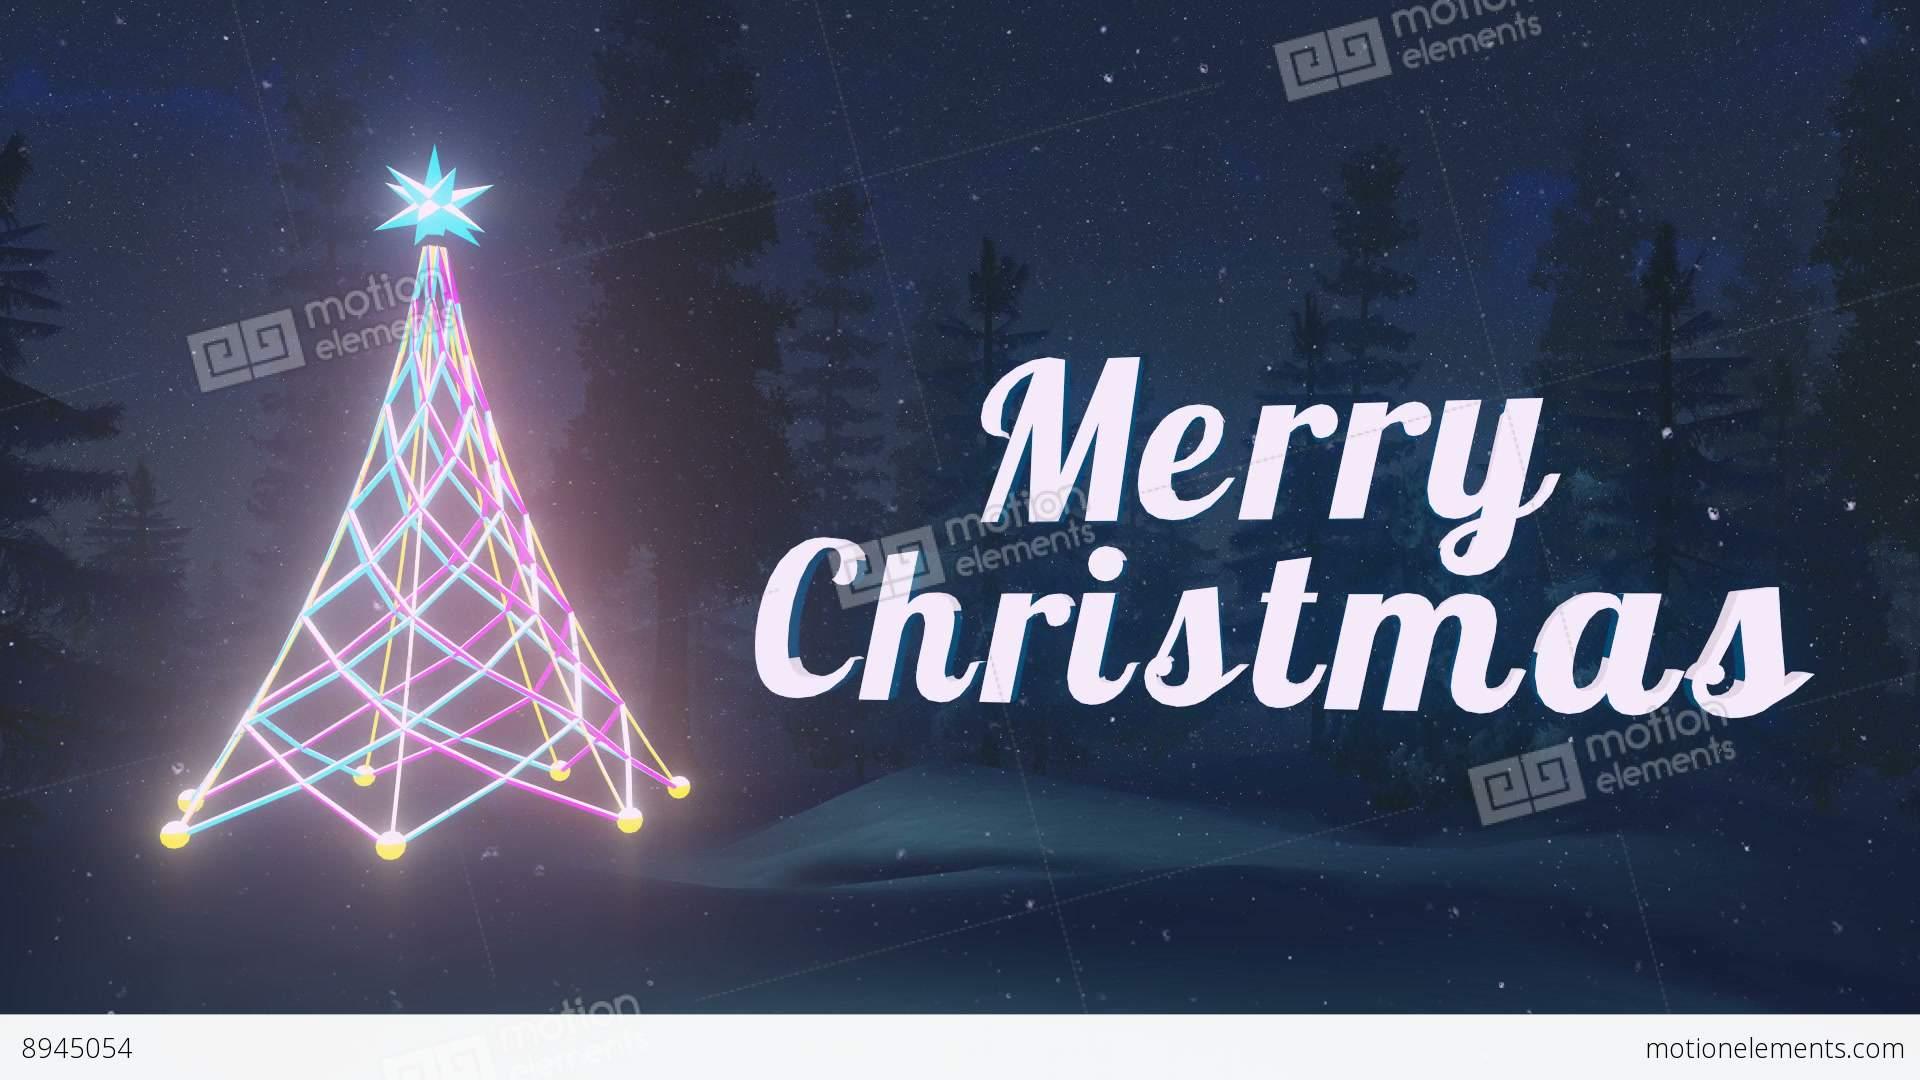 animated merry christmas at dark night loopable stock video footage - Merry Christmas Animated